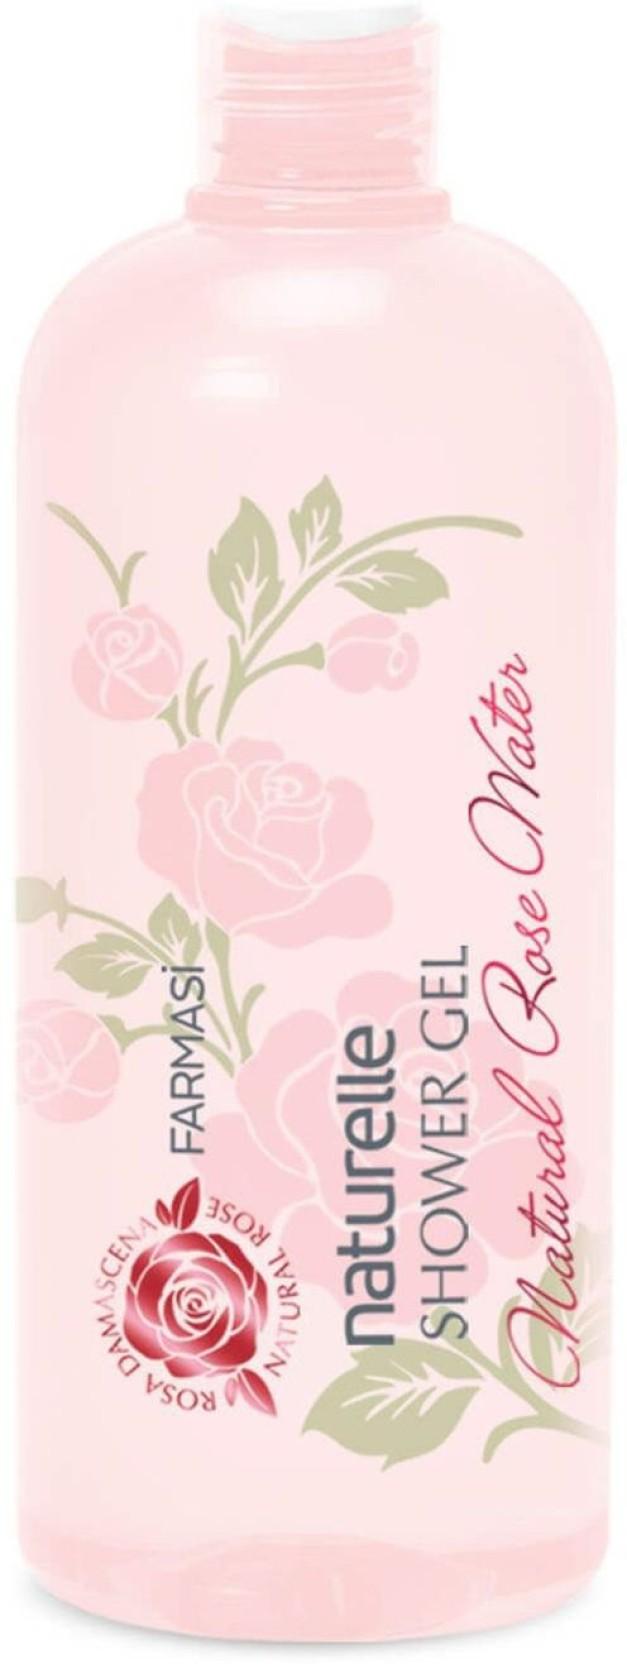 Farmasi Naturelle Shower Gel Natural Rose Water 375ml 1275oz